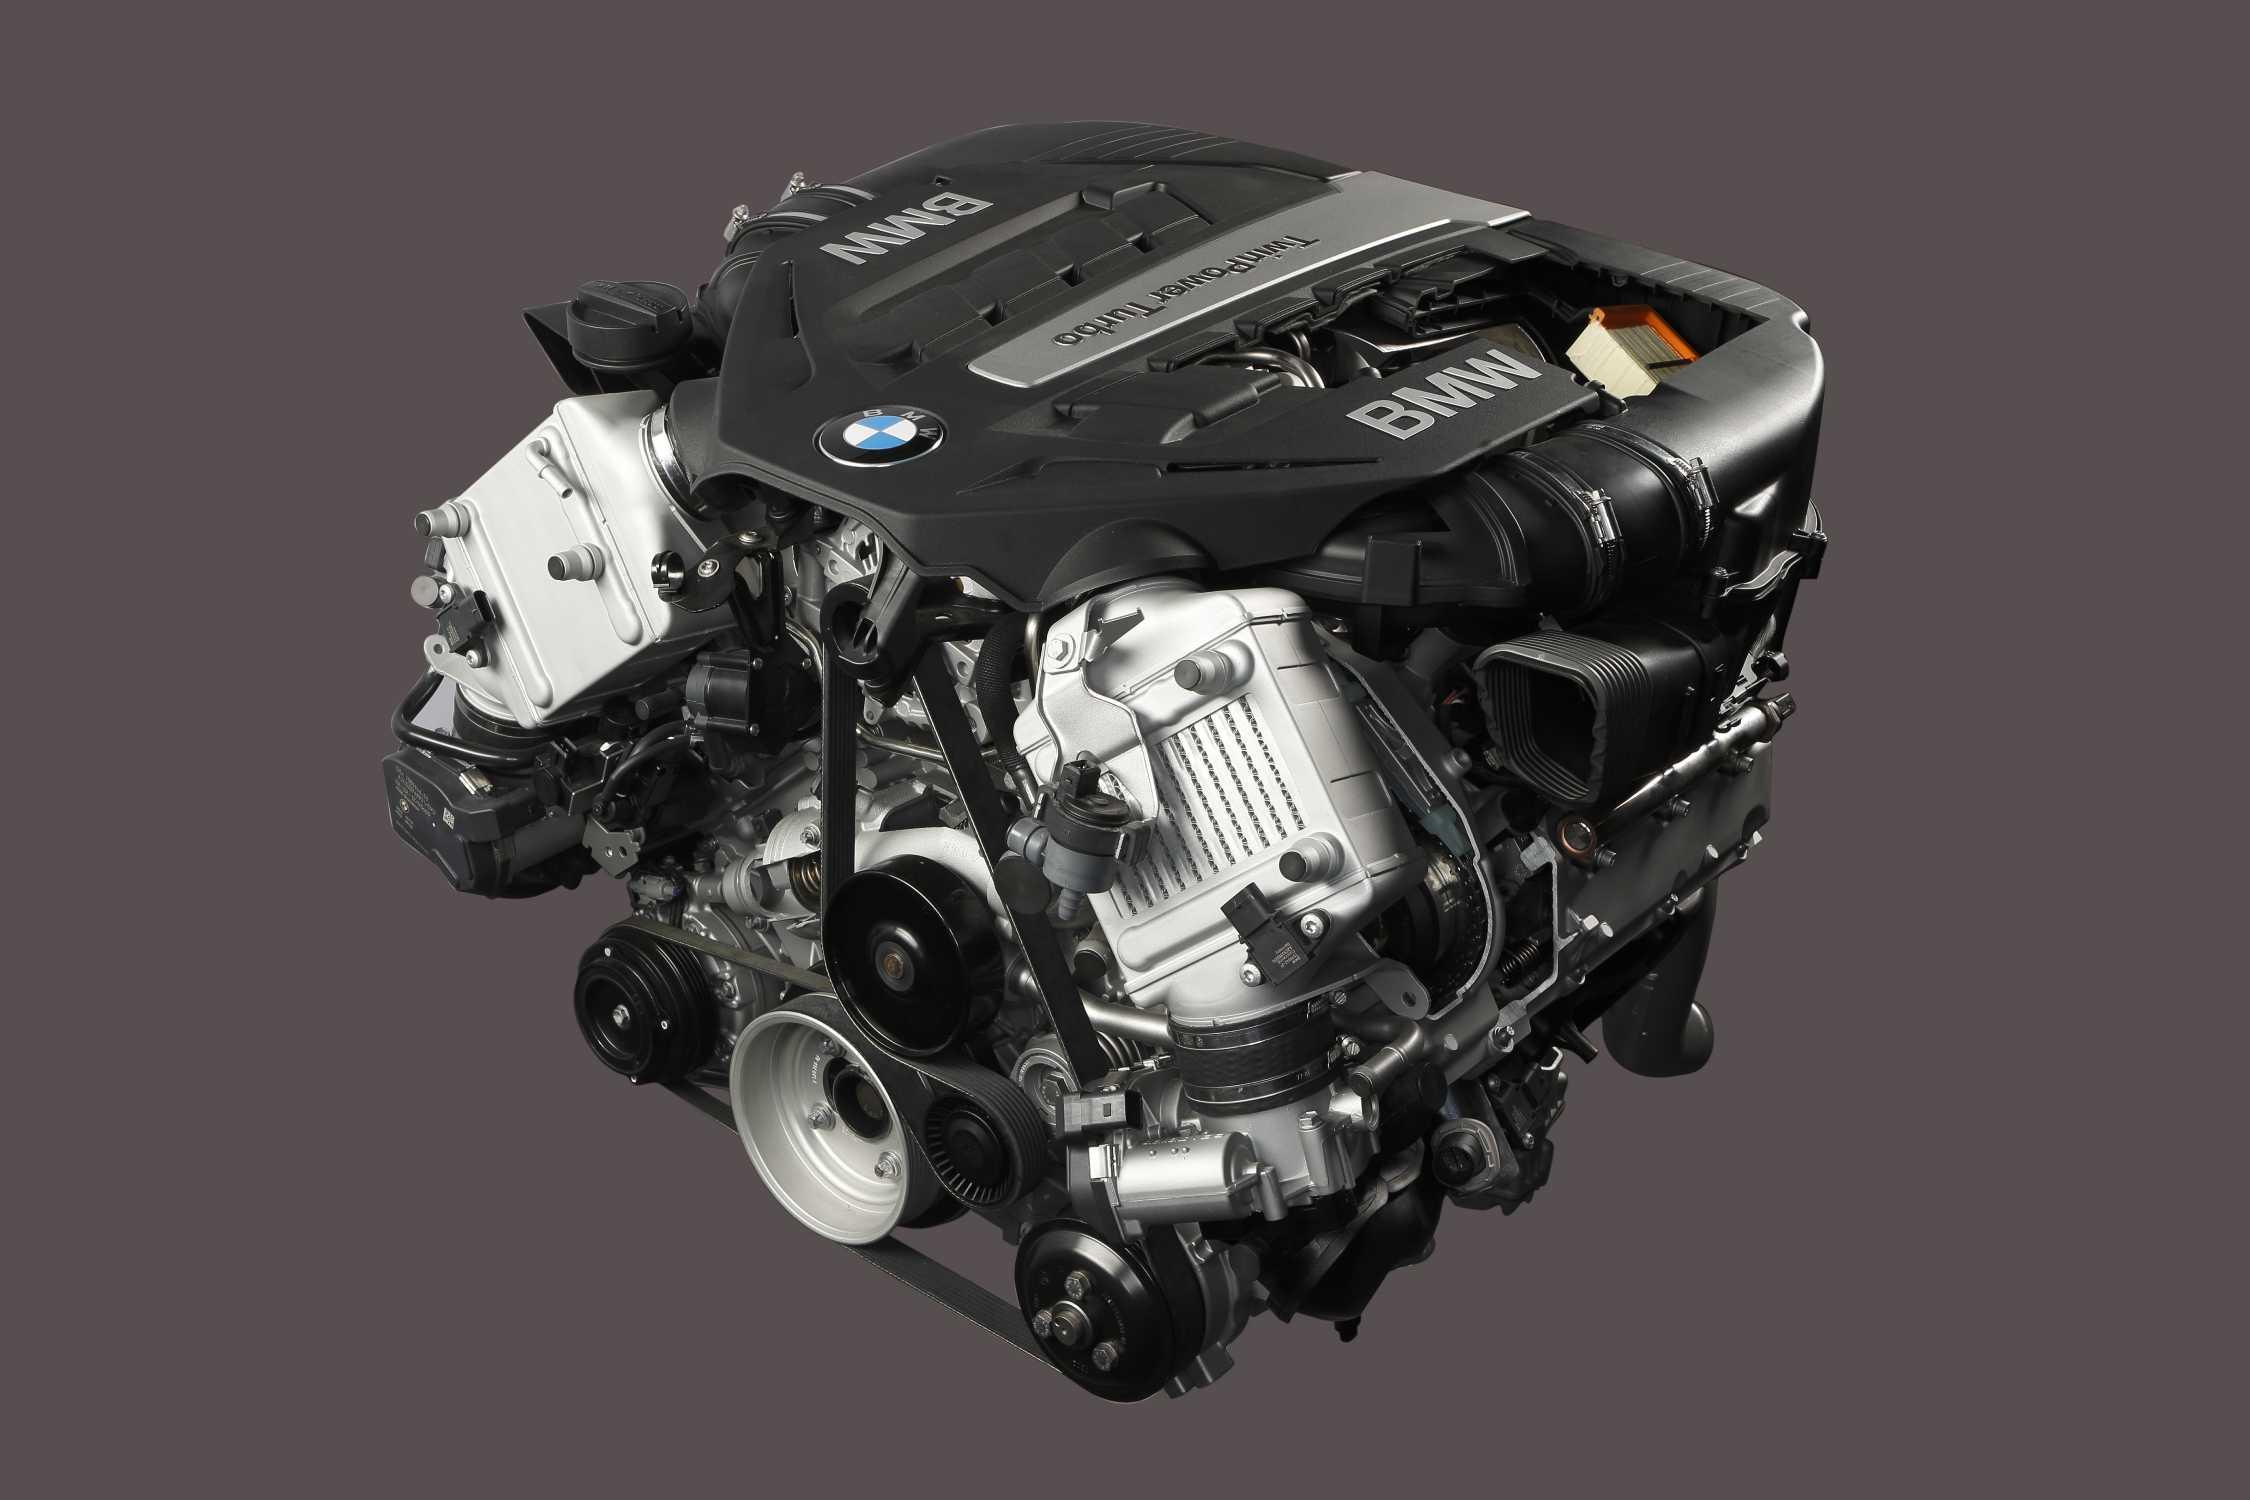 bmw twinpower turbo 8 zylinder benzin motor. Black Bedroom Furniture Sets. Home Design Ideas